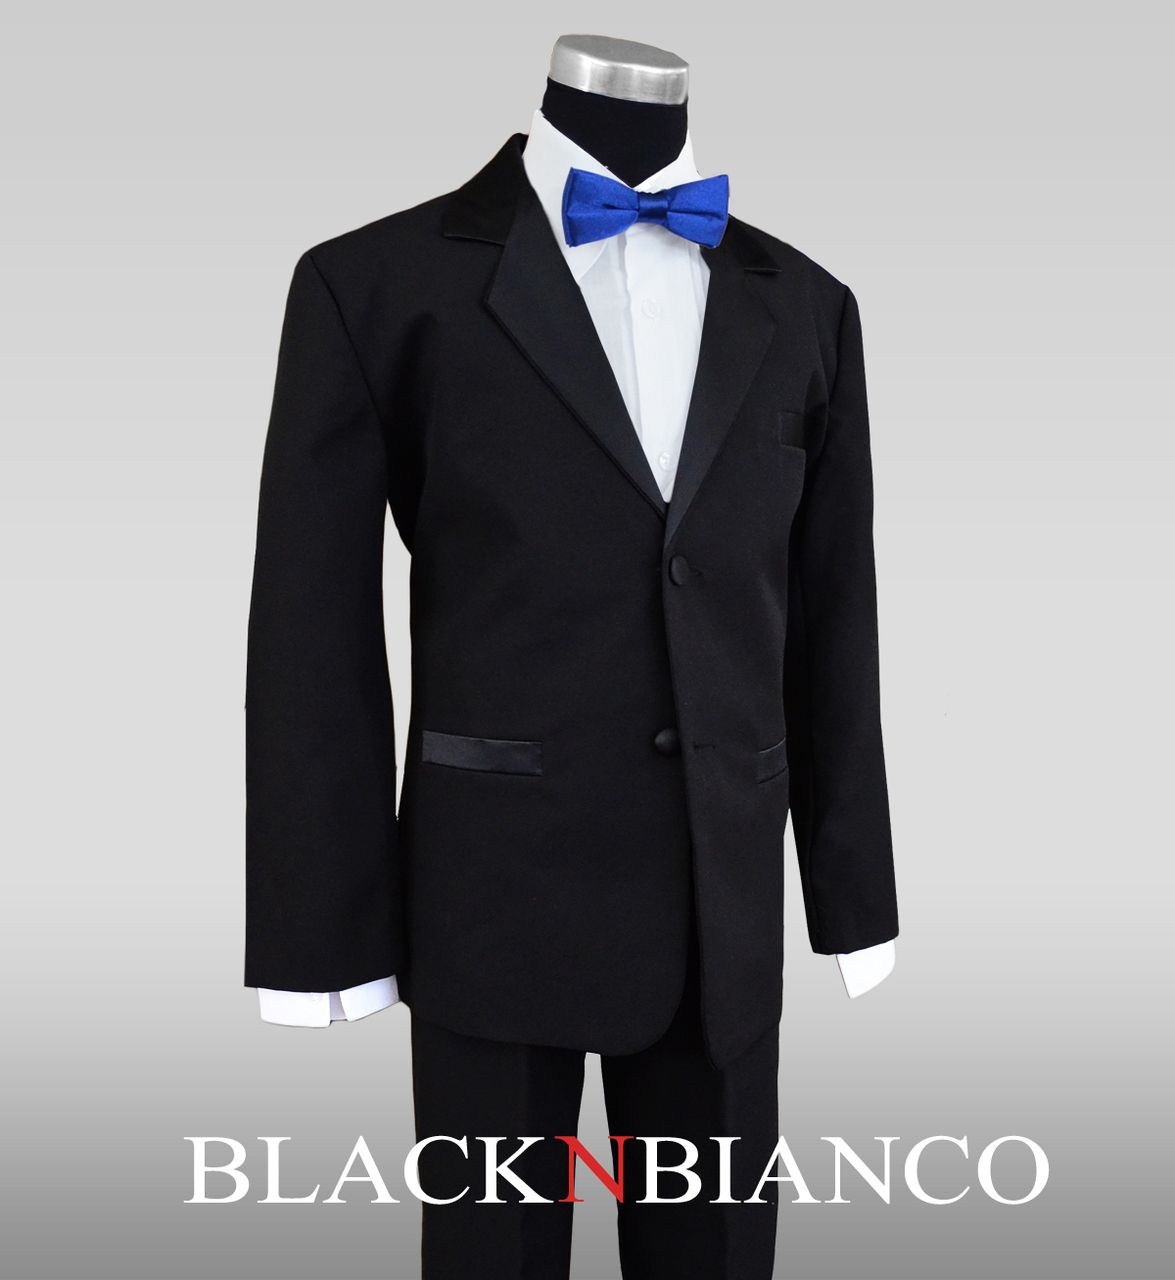 Boys Tuxedo with Royal Blue Slim Bow Tie | Pinterest